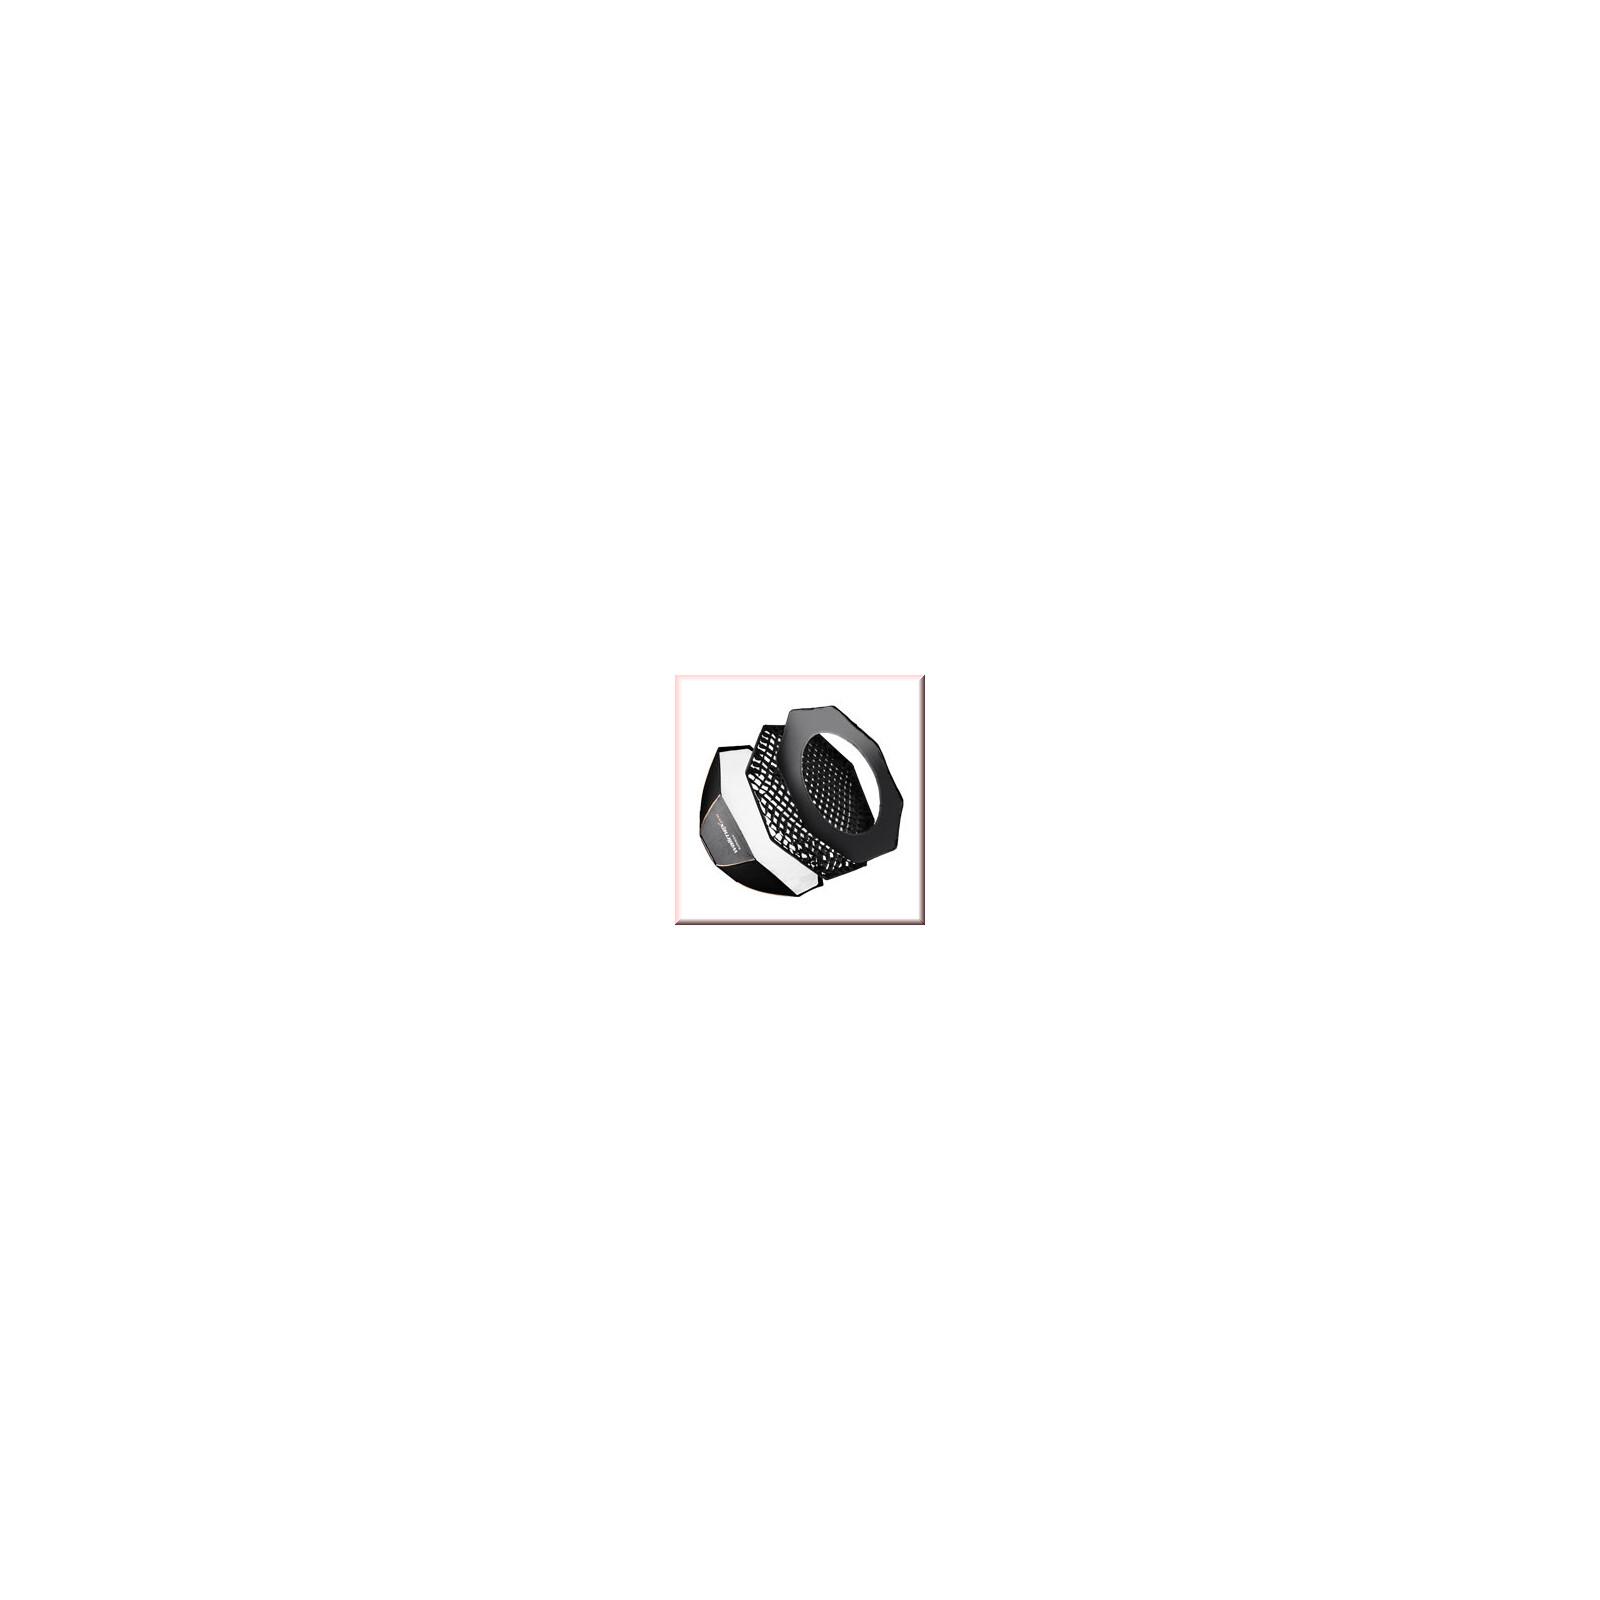 walimex pro Octa Softbox PLUS OL Ø90 Auro/Bowens